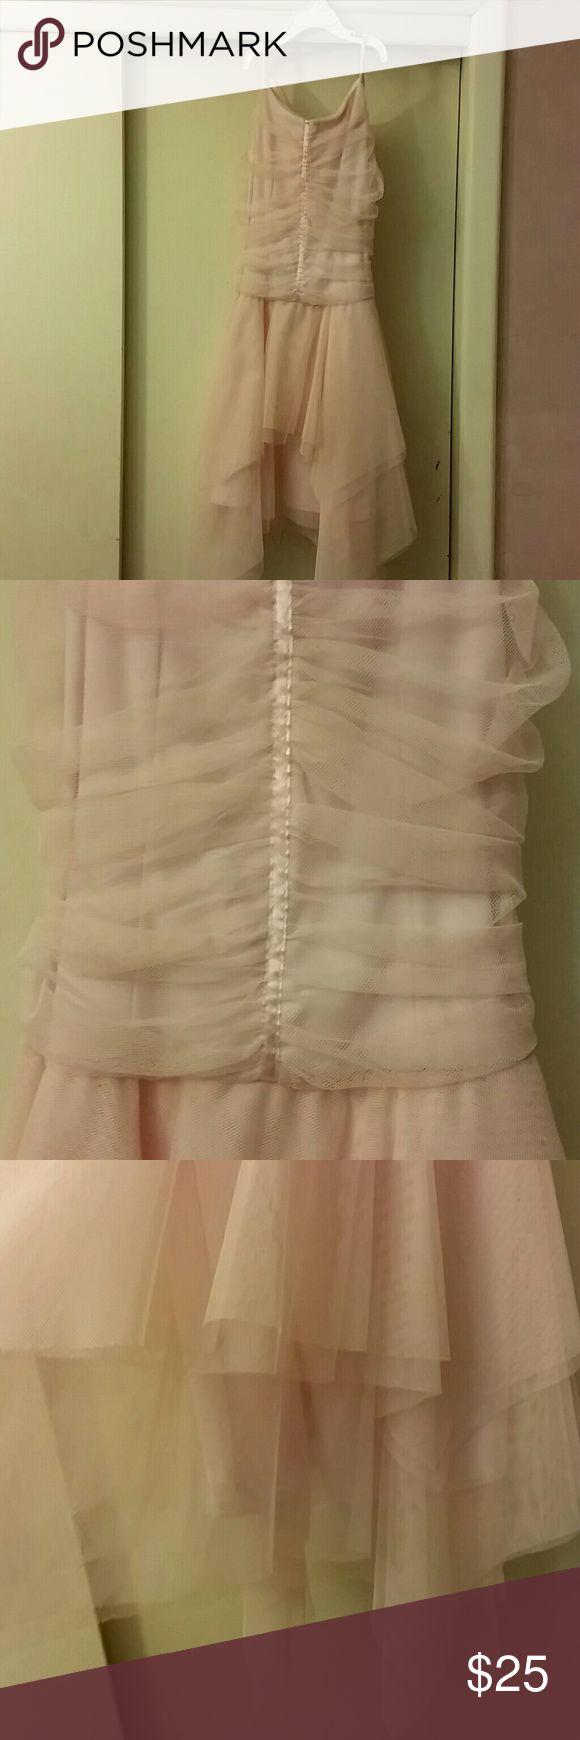 Jessica  McClintock girls dress Pale pink  tulle hankerchief spaghetti straps with satin ribbon belt NWOT. Got forgotten in the closet. Jessica McClintock Dresses Formal